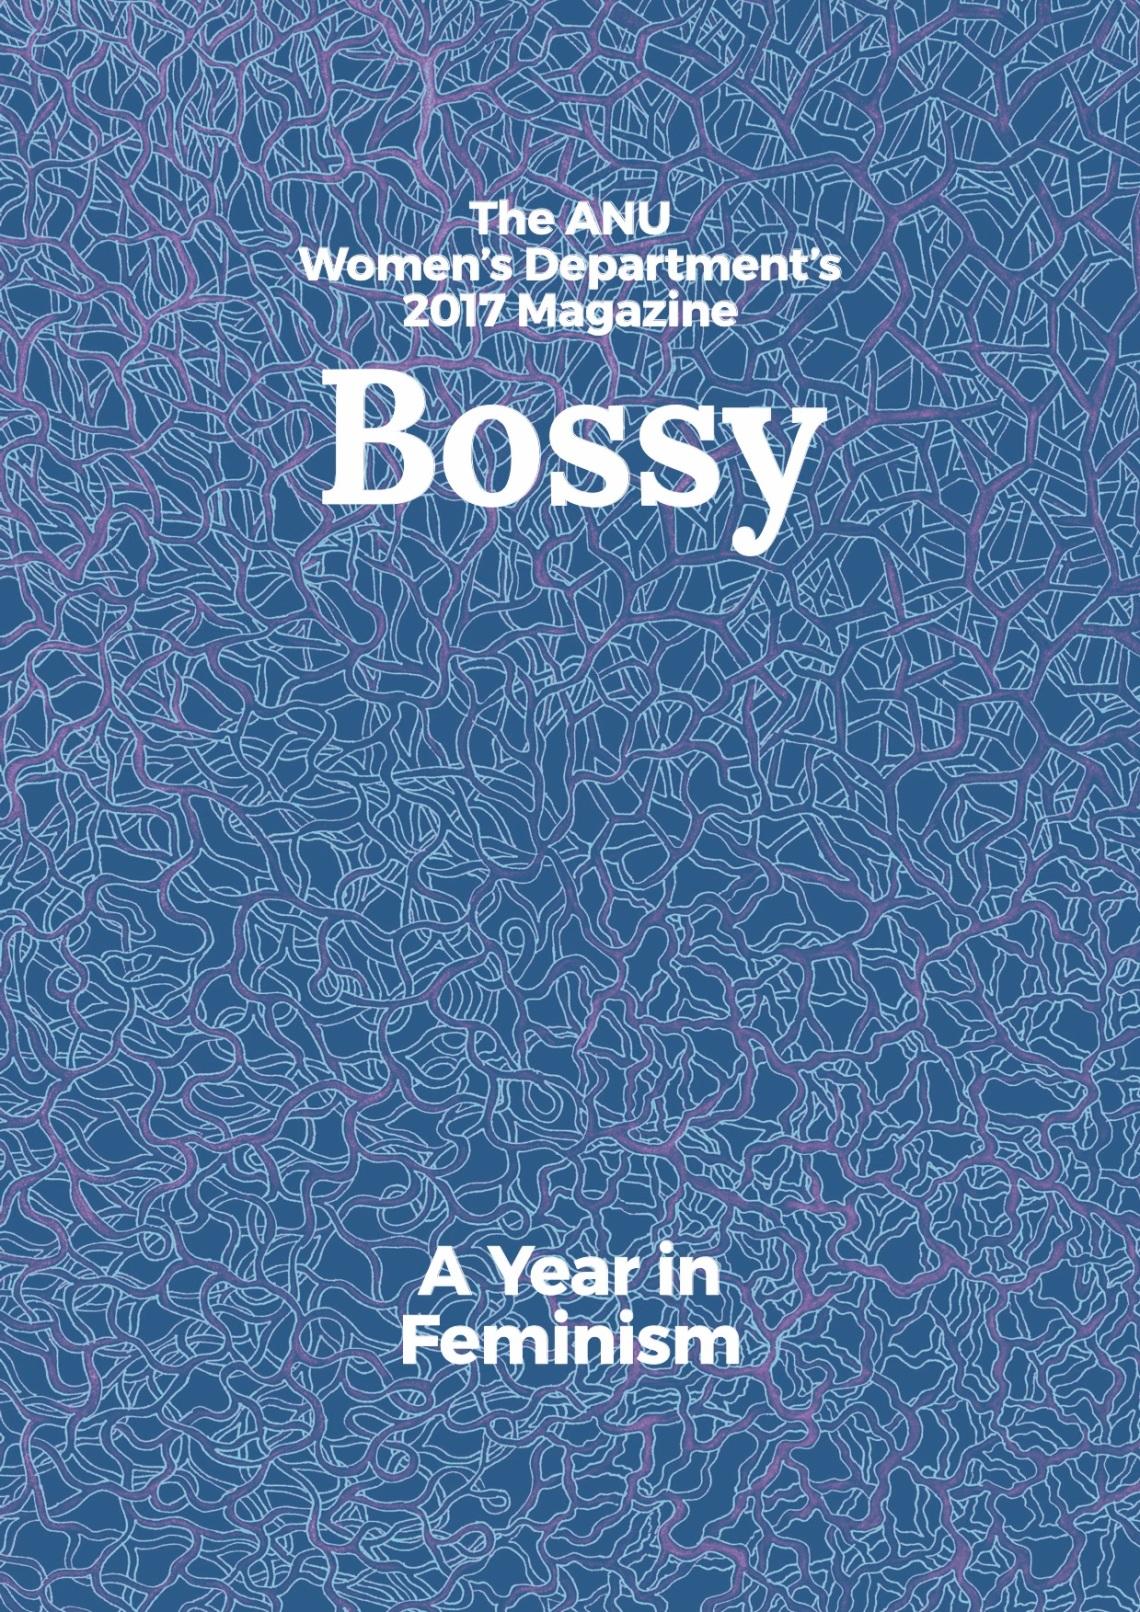 bossy copy1